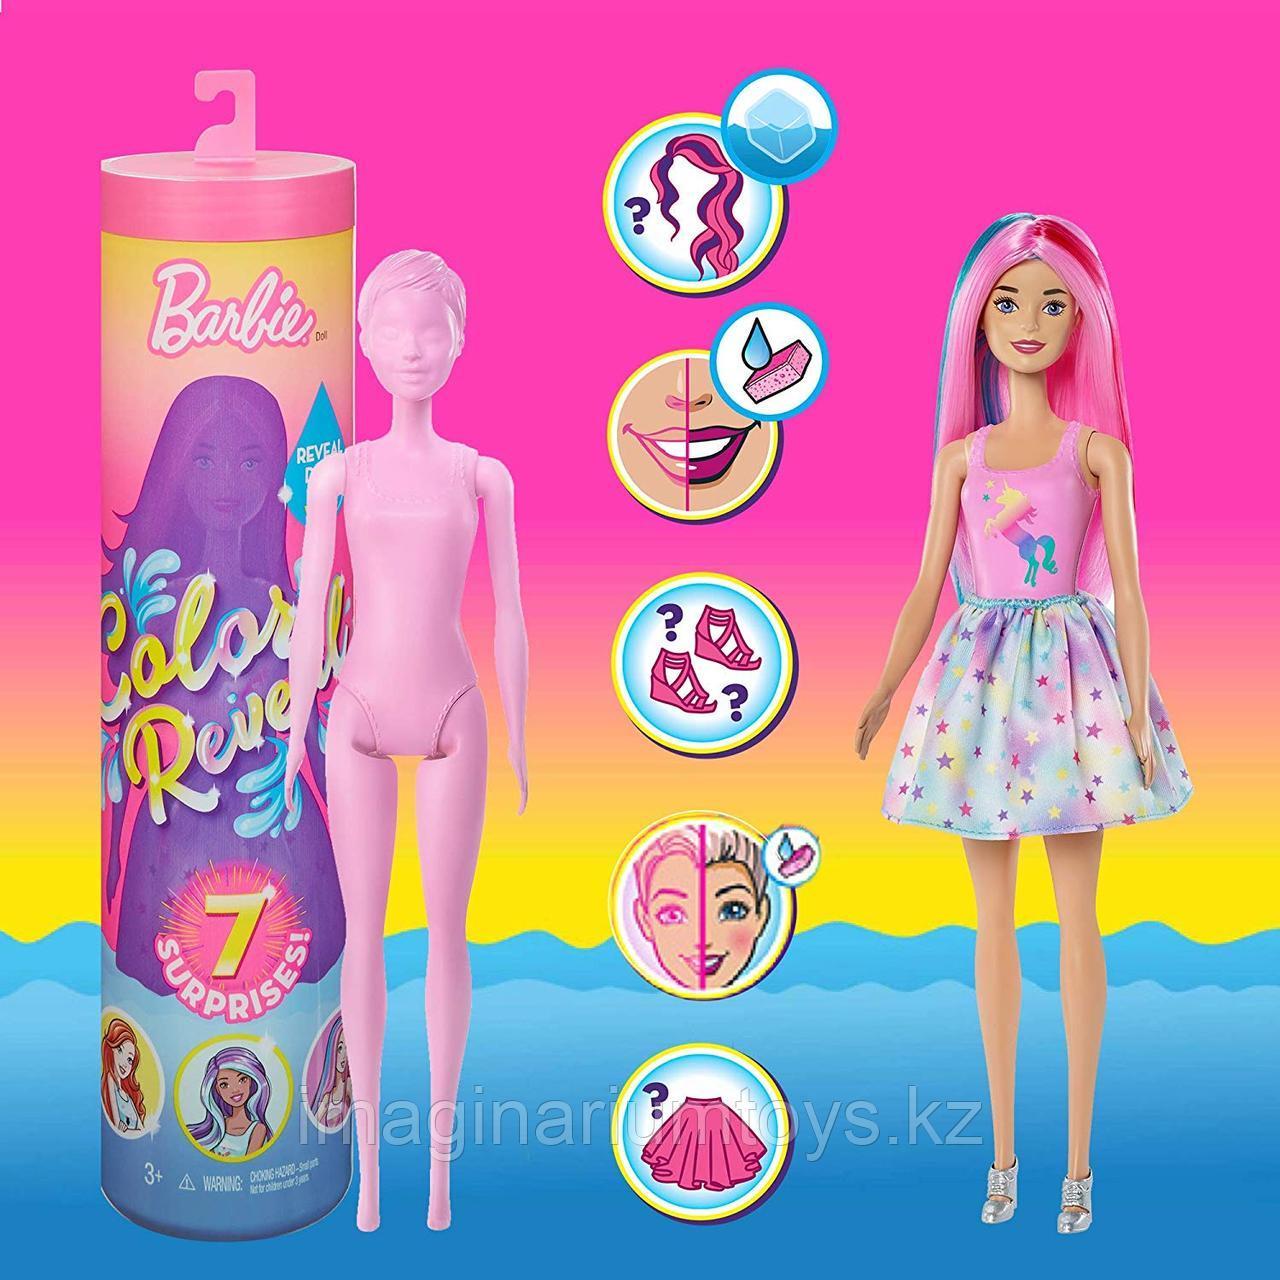 Кукла Барби меняющая цвет в воде Barbie Color Reveal